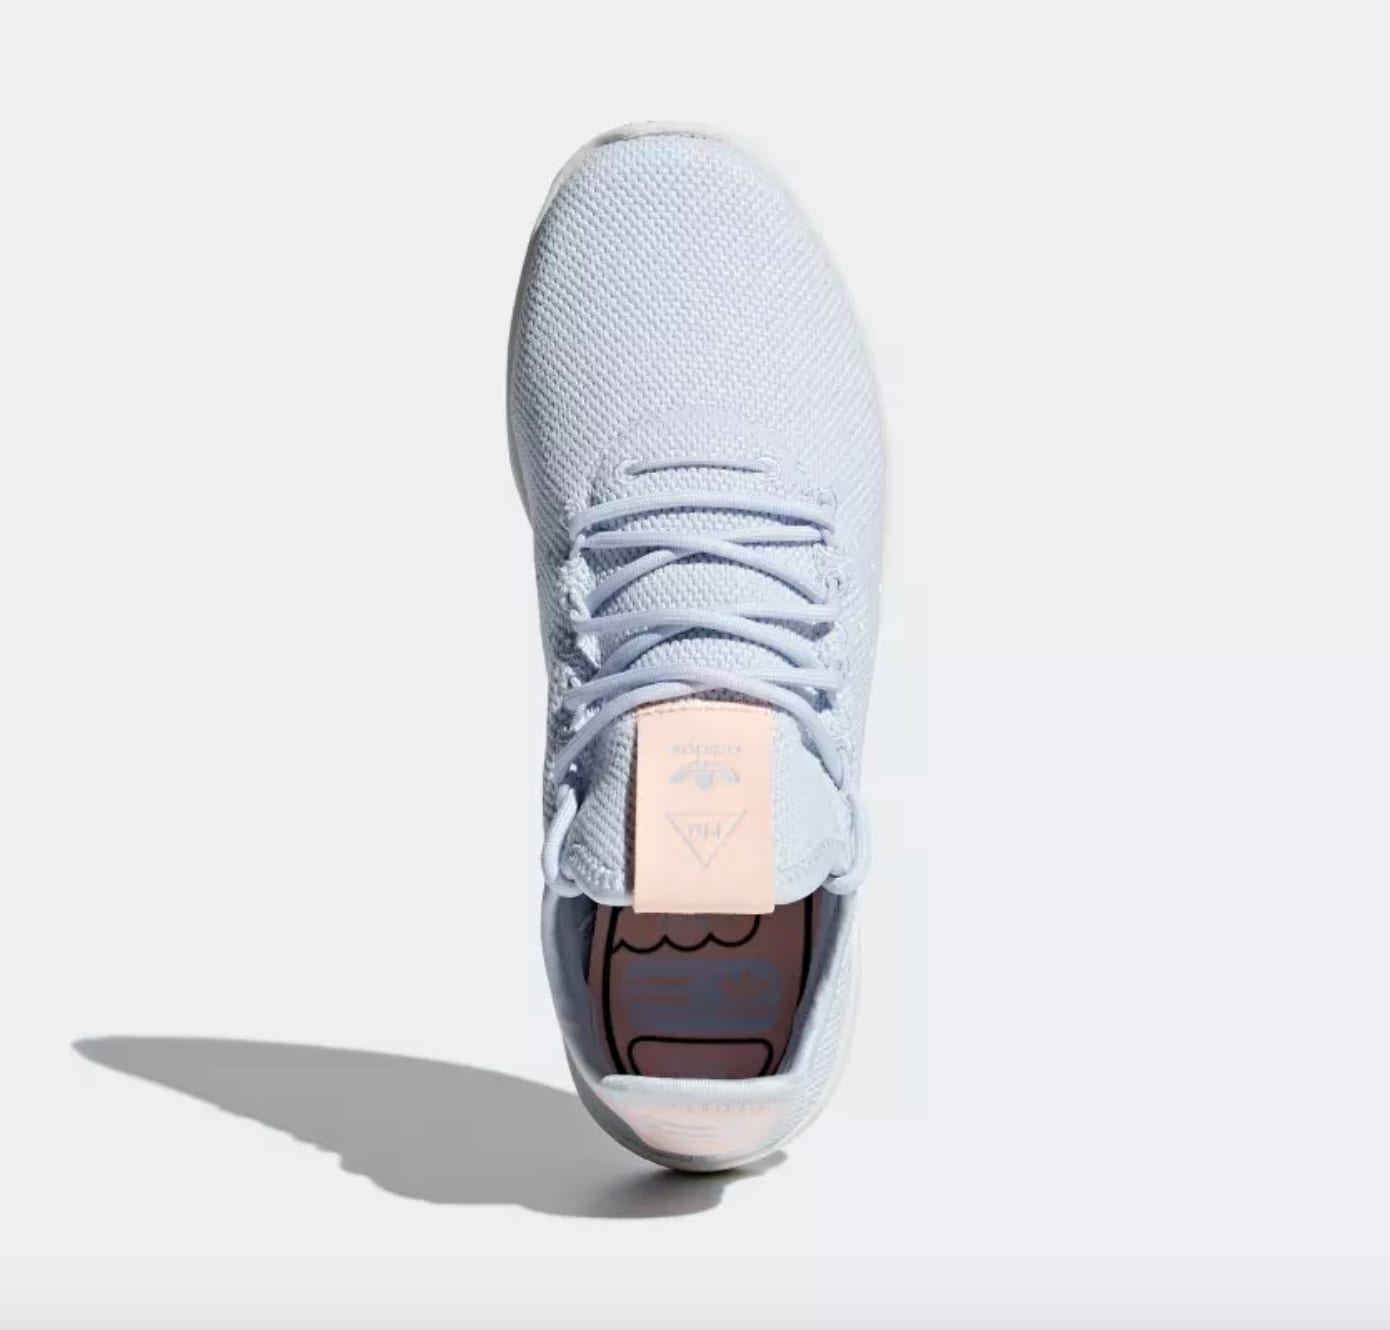 Pharrell x Adidas Tennis Hu B41884 (Top)